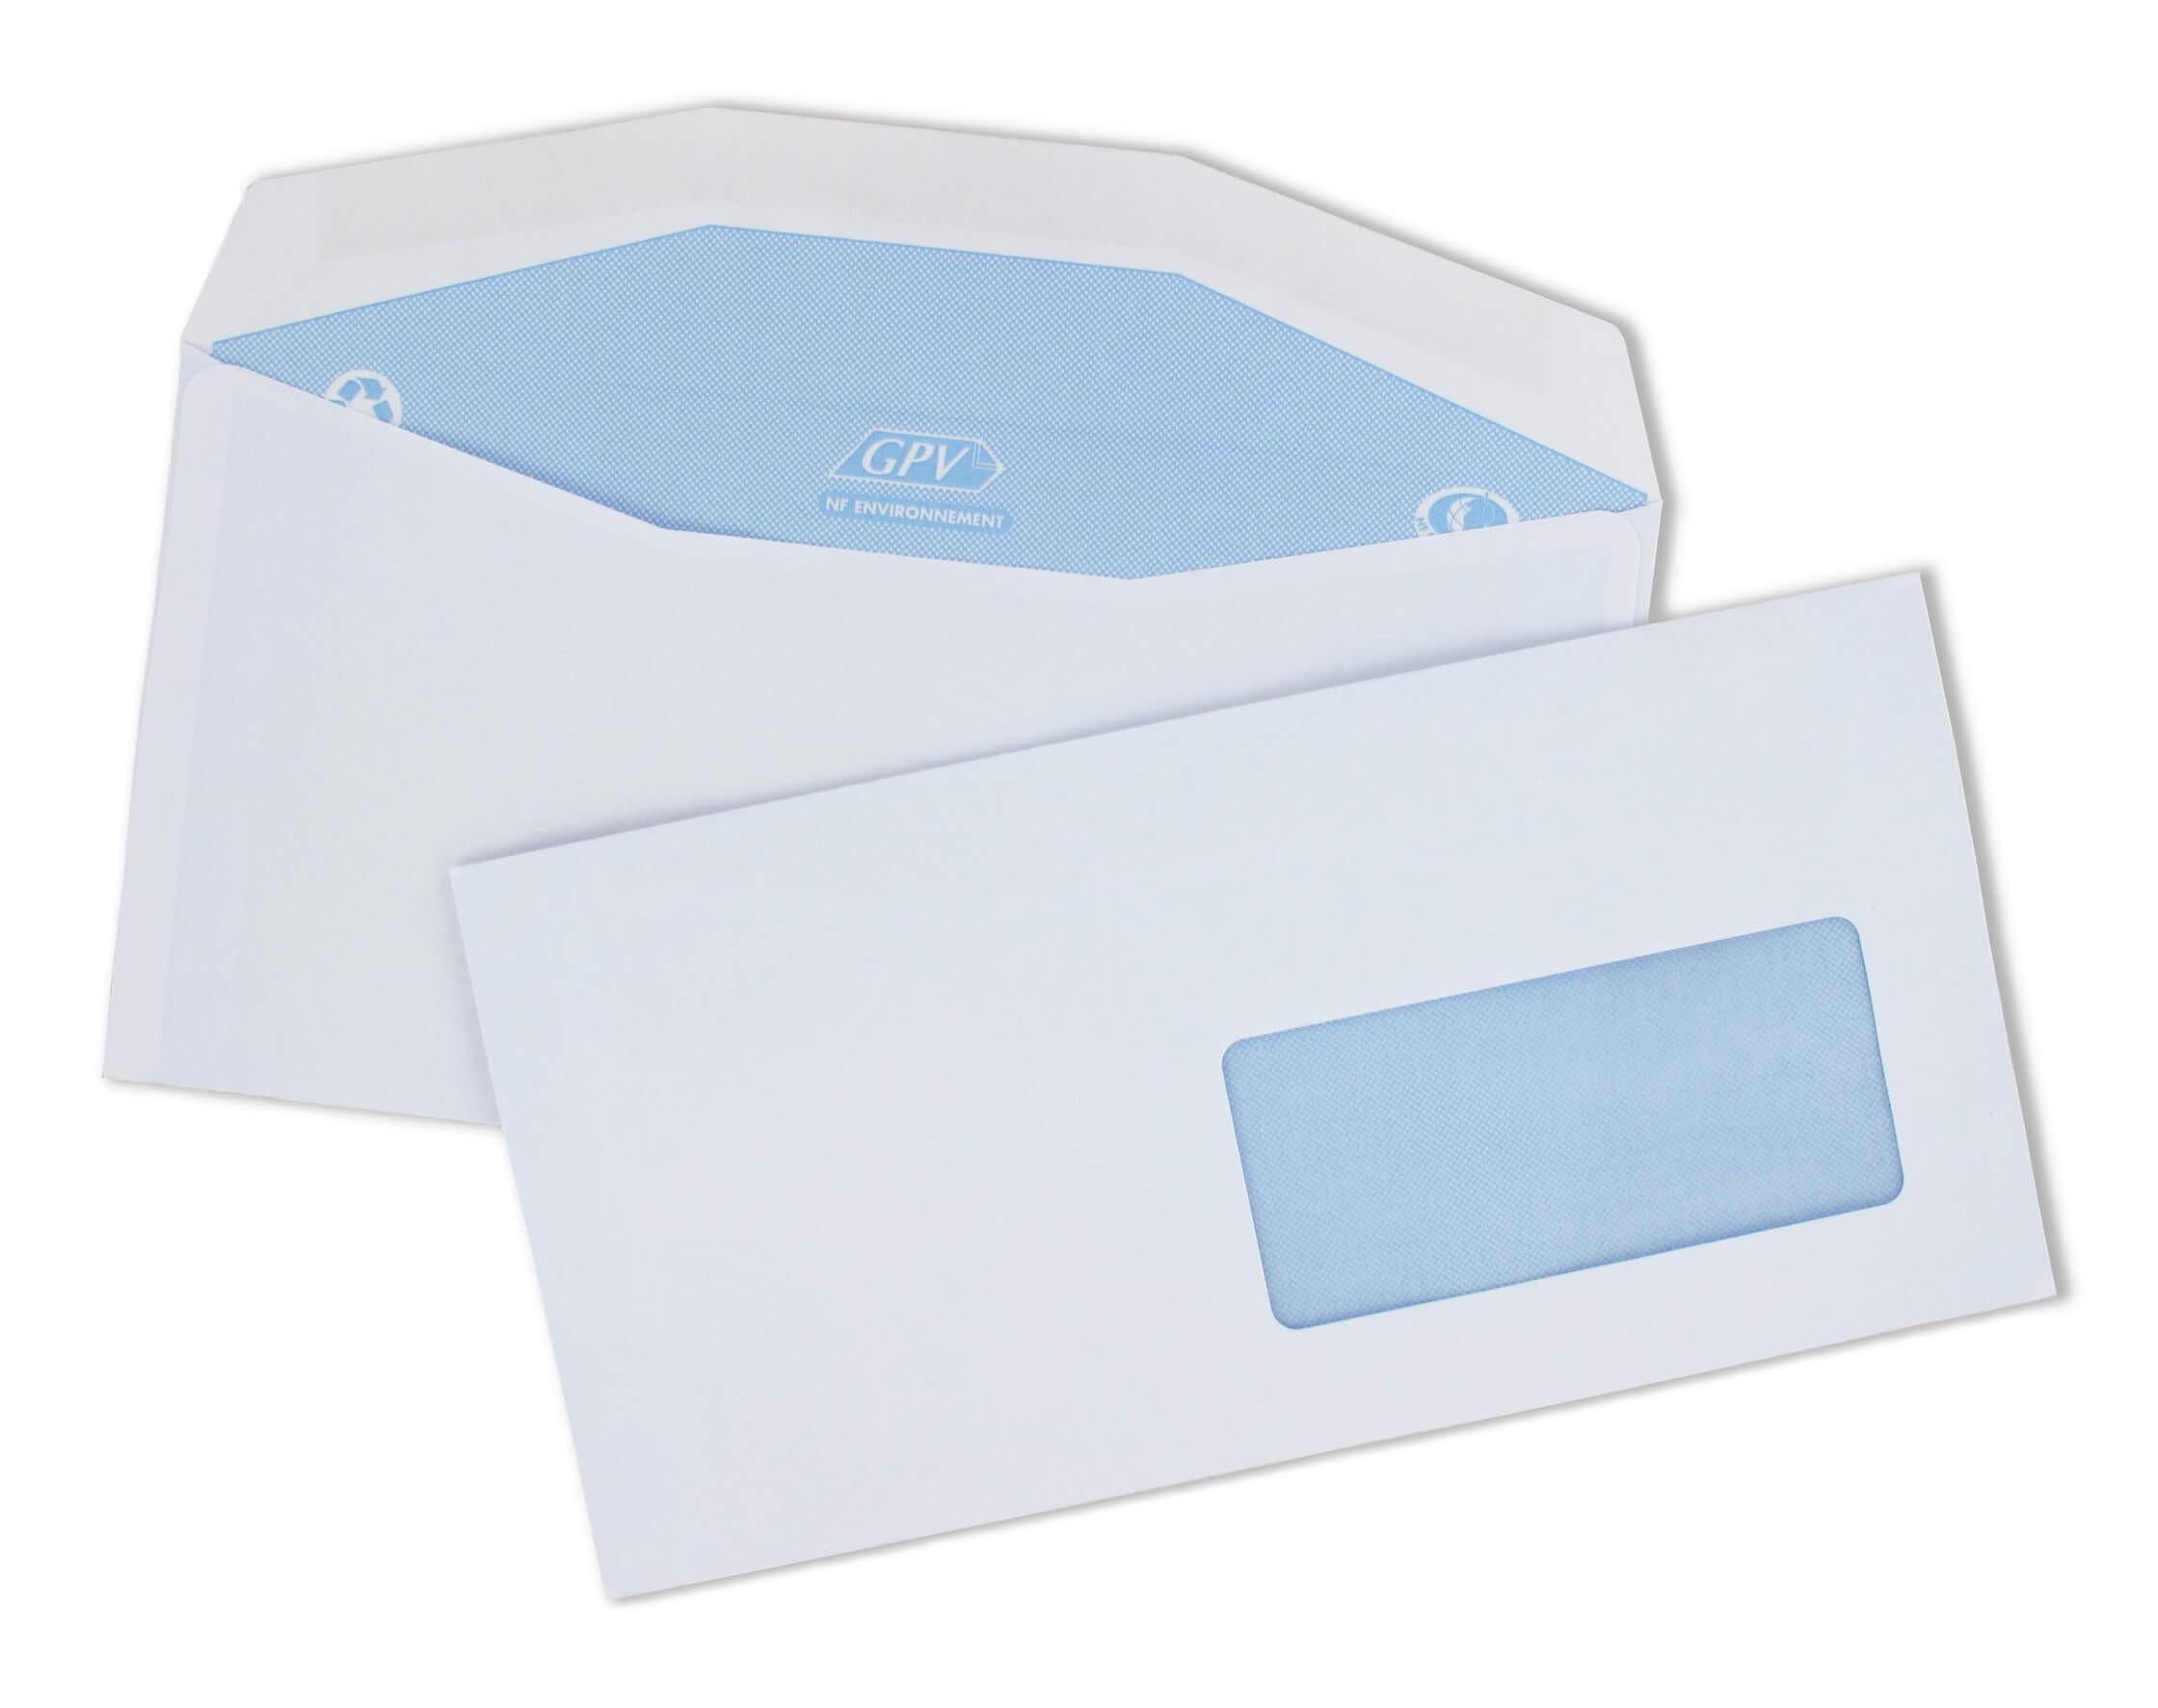 Pdf enveloppe fenetre dimension for Enveloppe fenetre